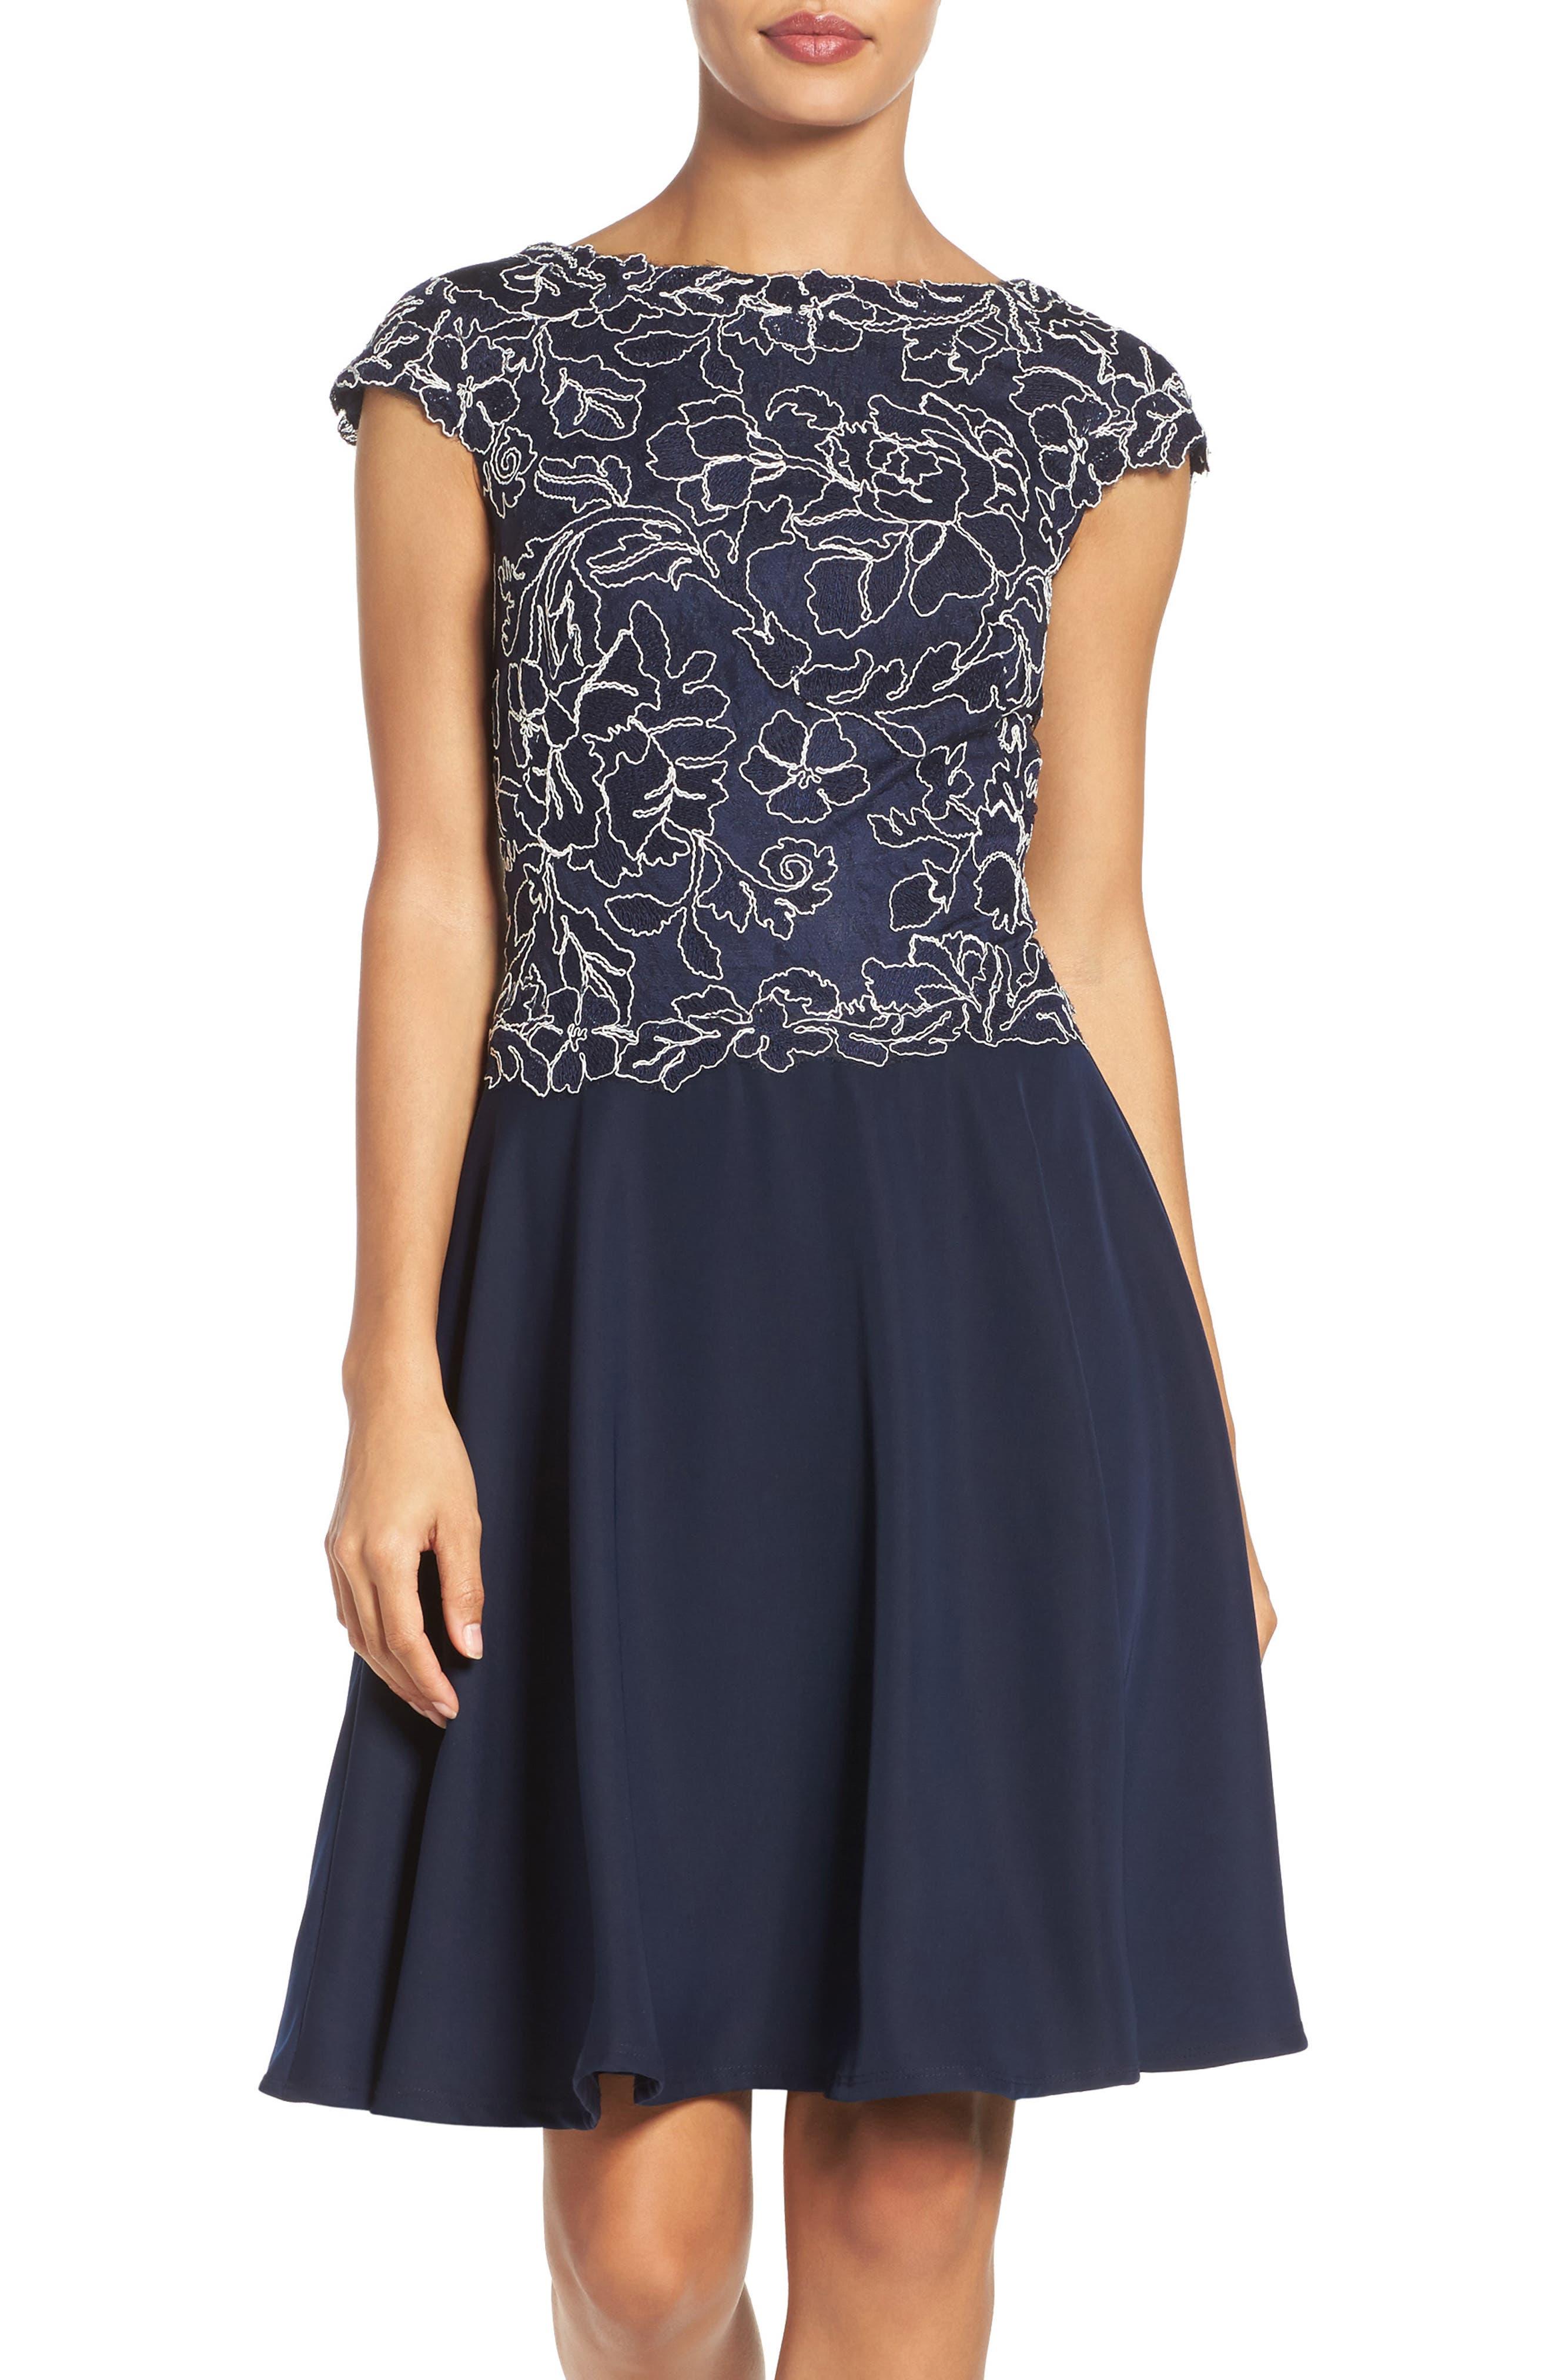 Tadashi Shoji Embroidered Lace Fit & Flare Dress (Regular & Petite)